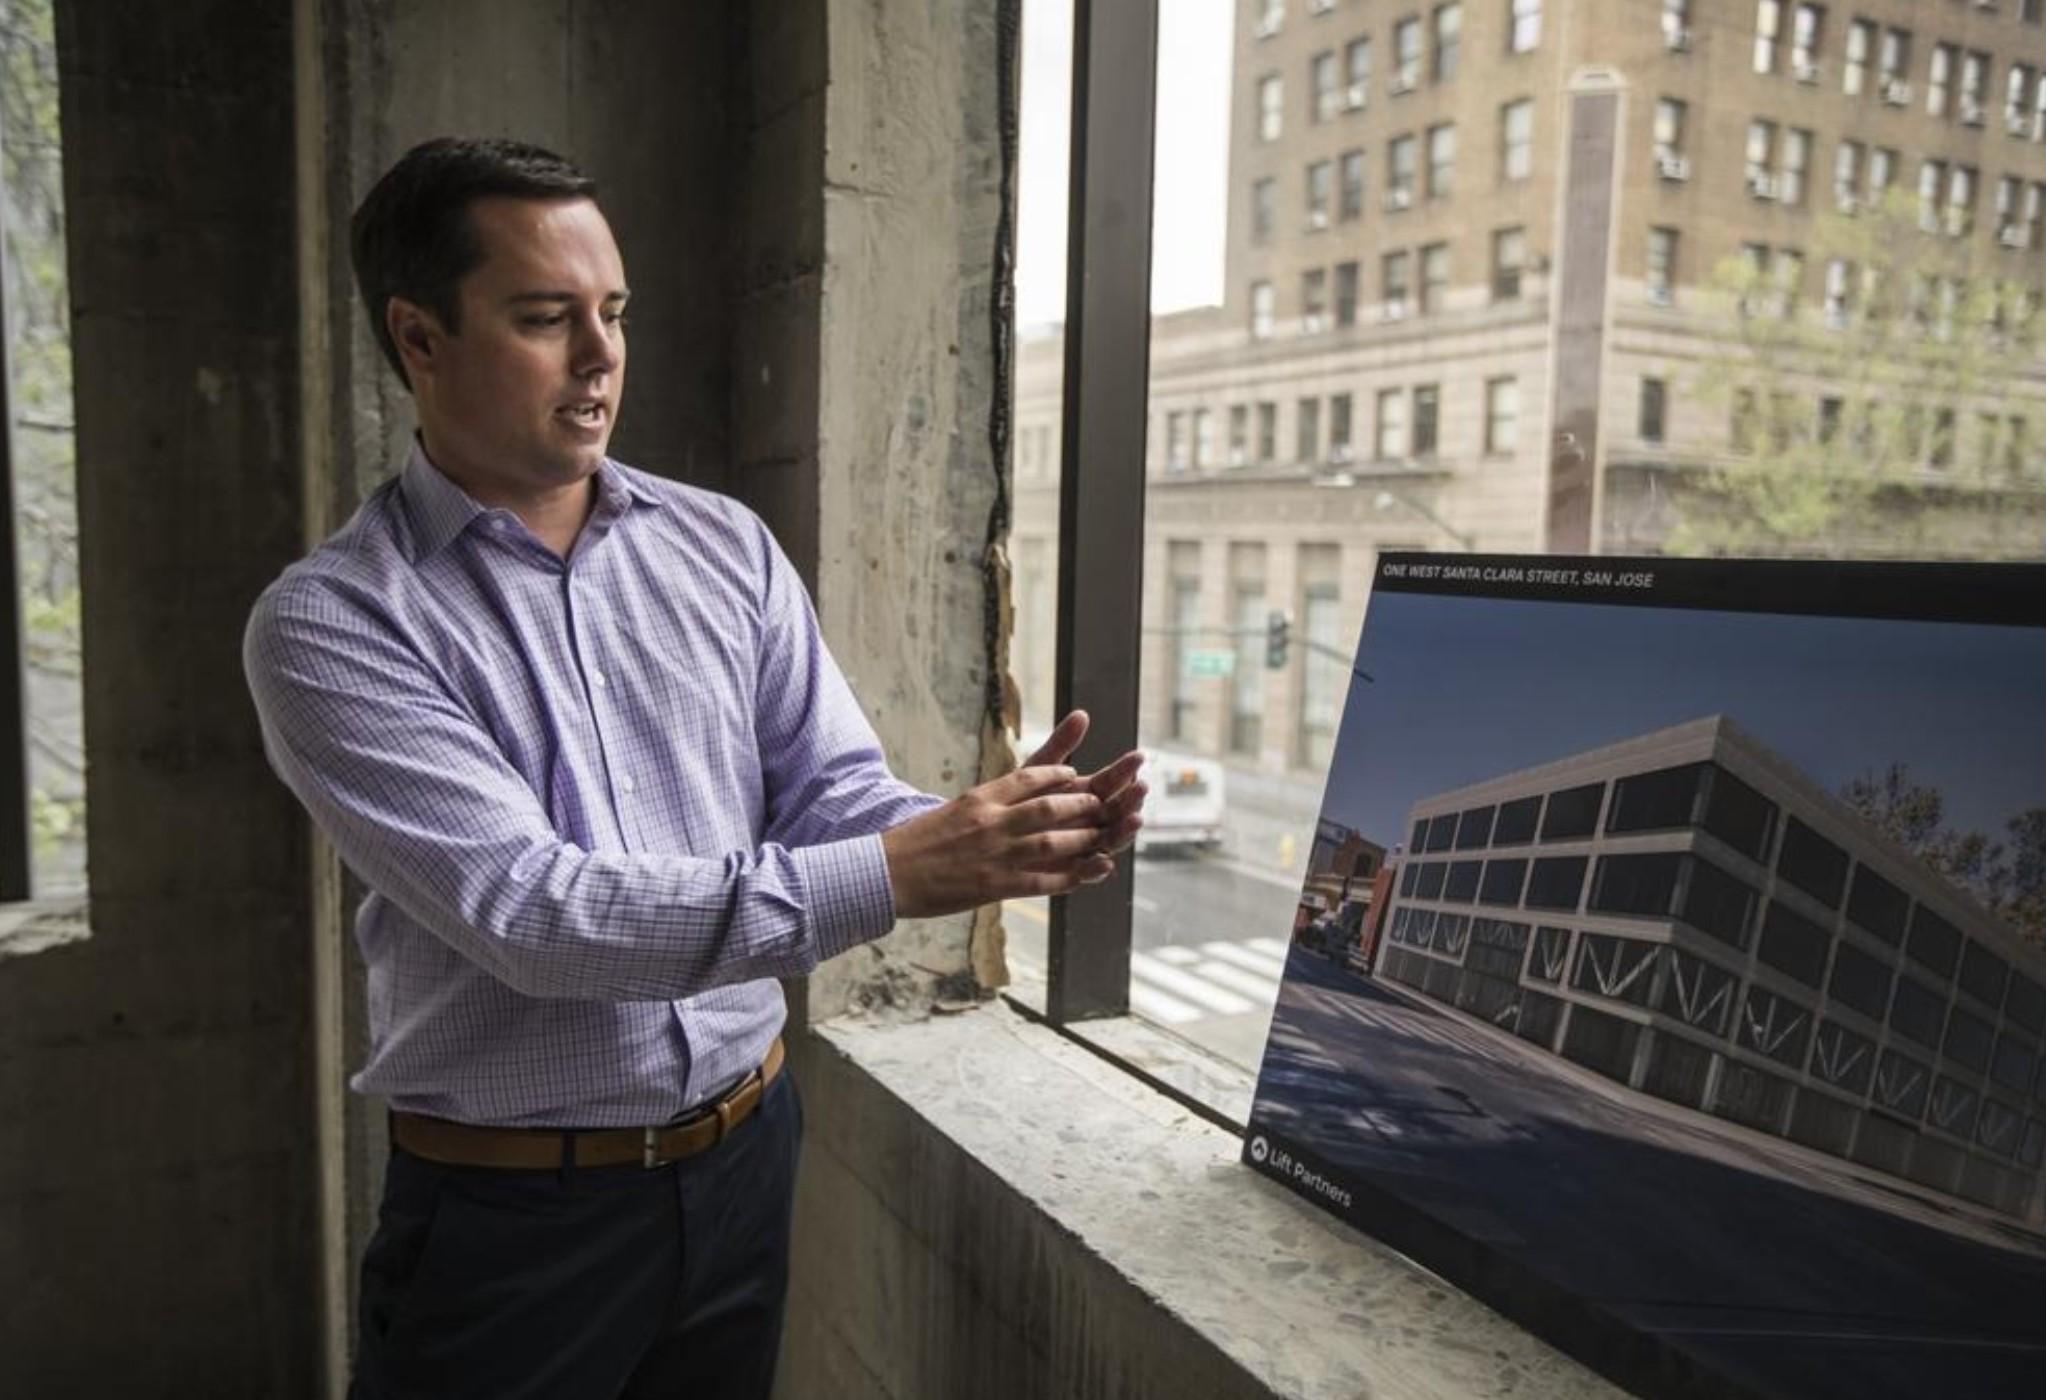 Freise describing Lift Partner's project at 1 W Santa Clara Street while under construction